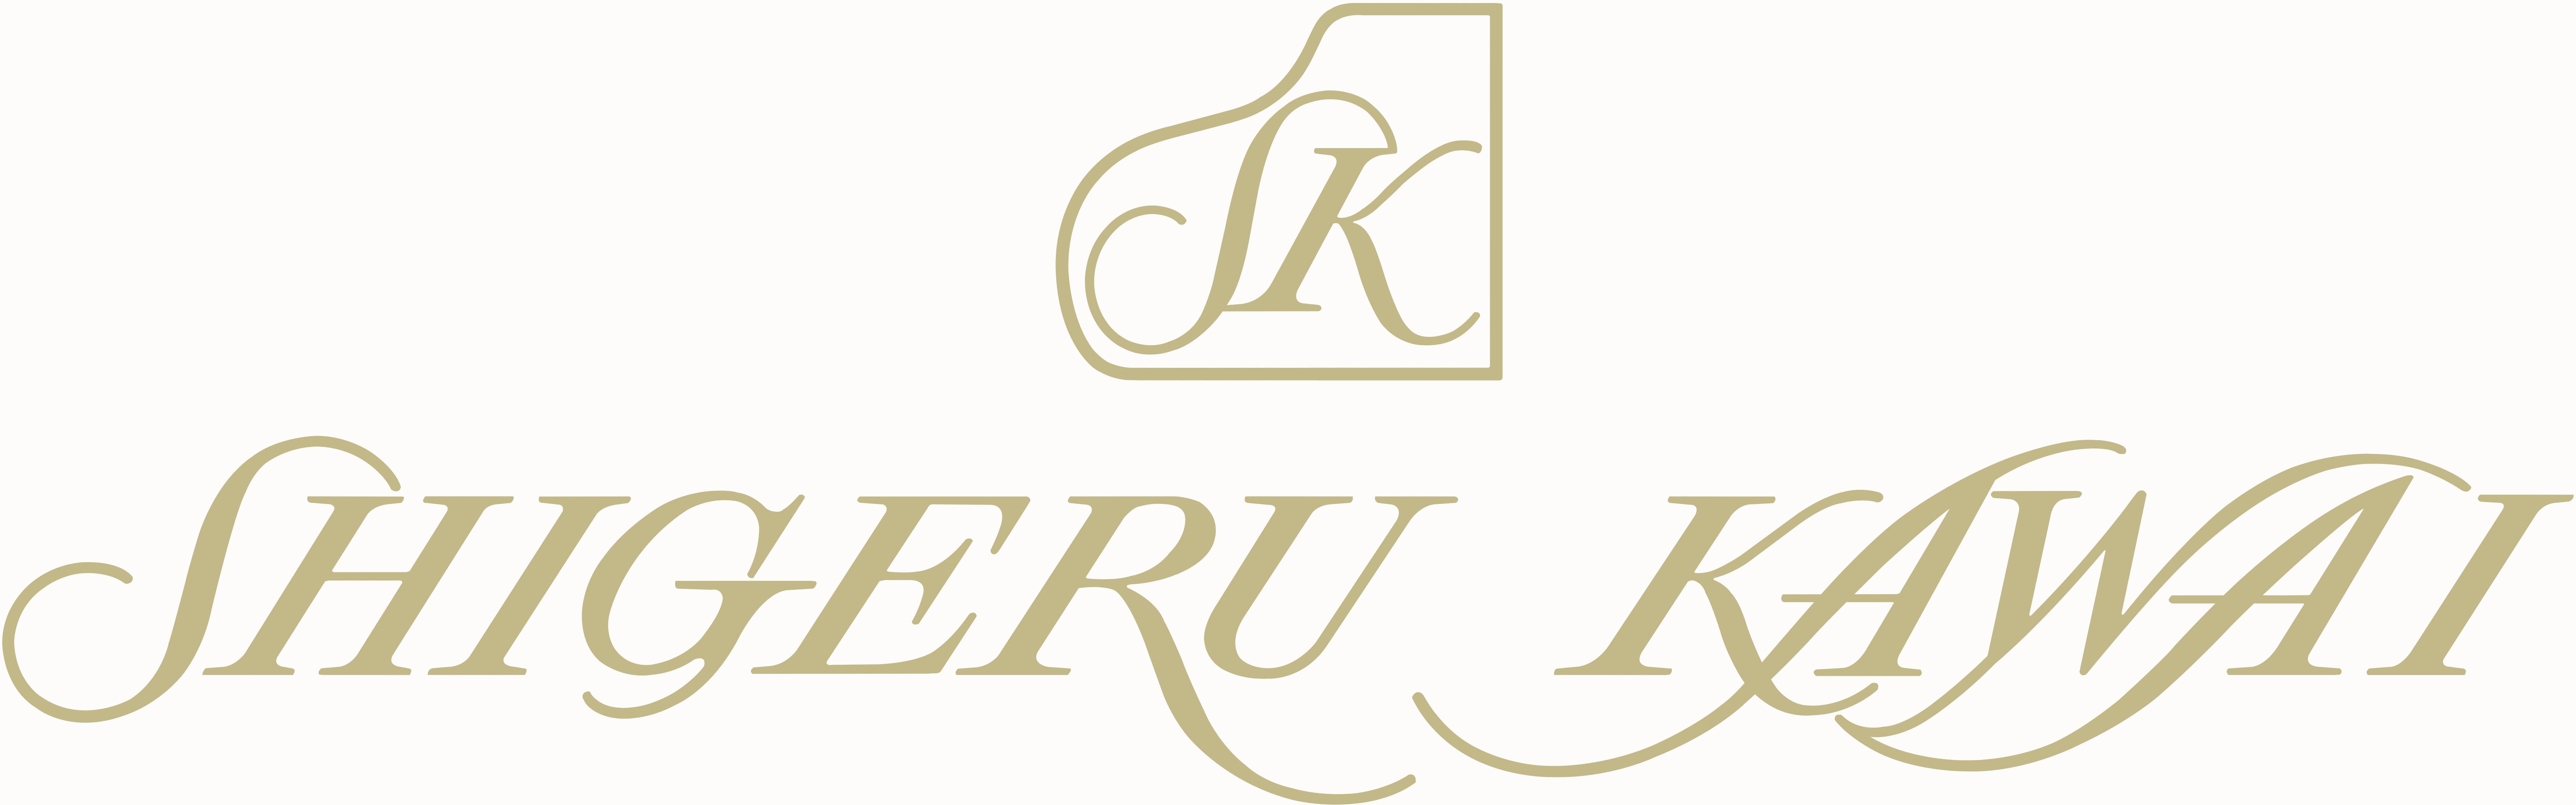 Shigeru Kawai logo JPEG copy